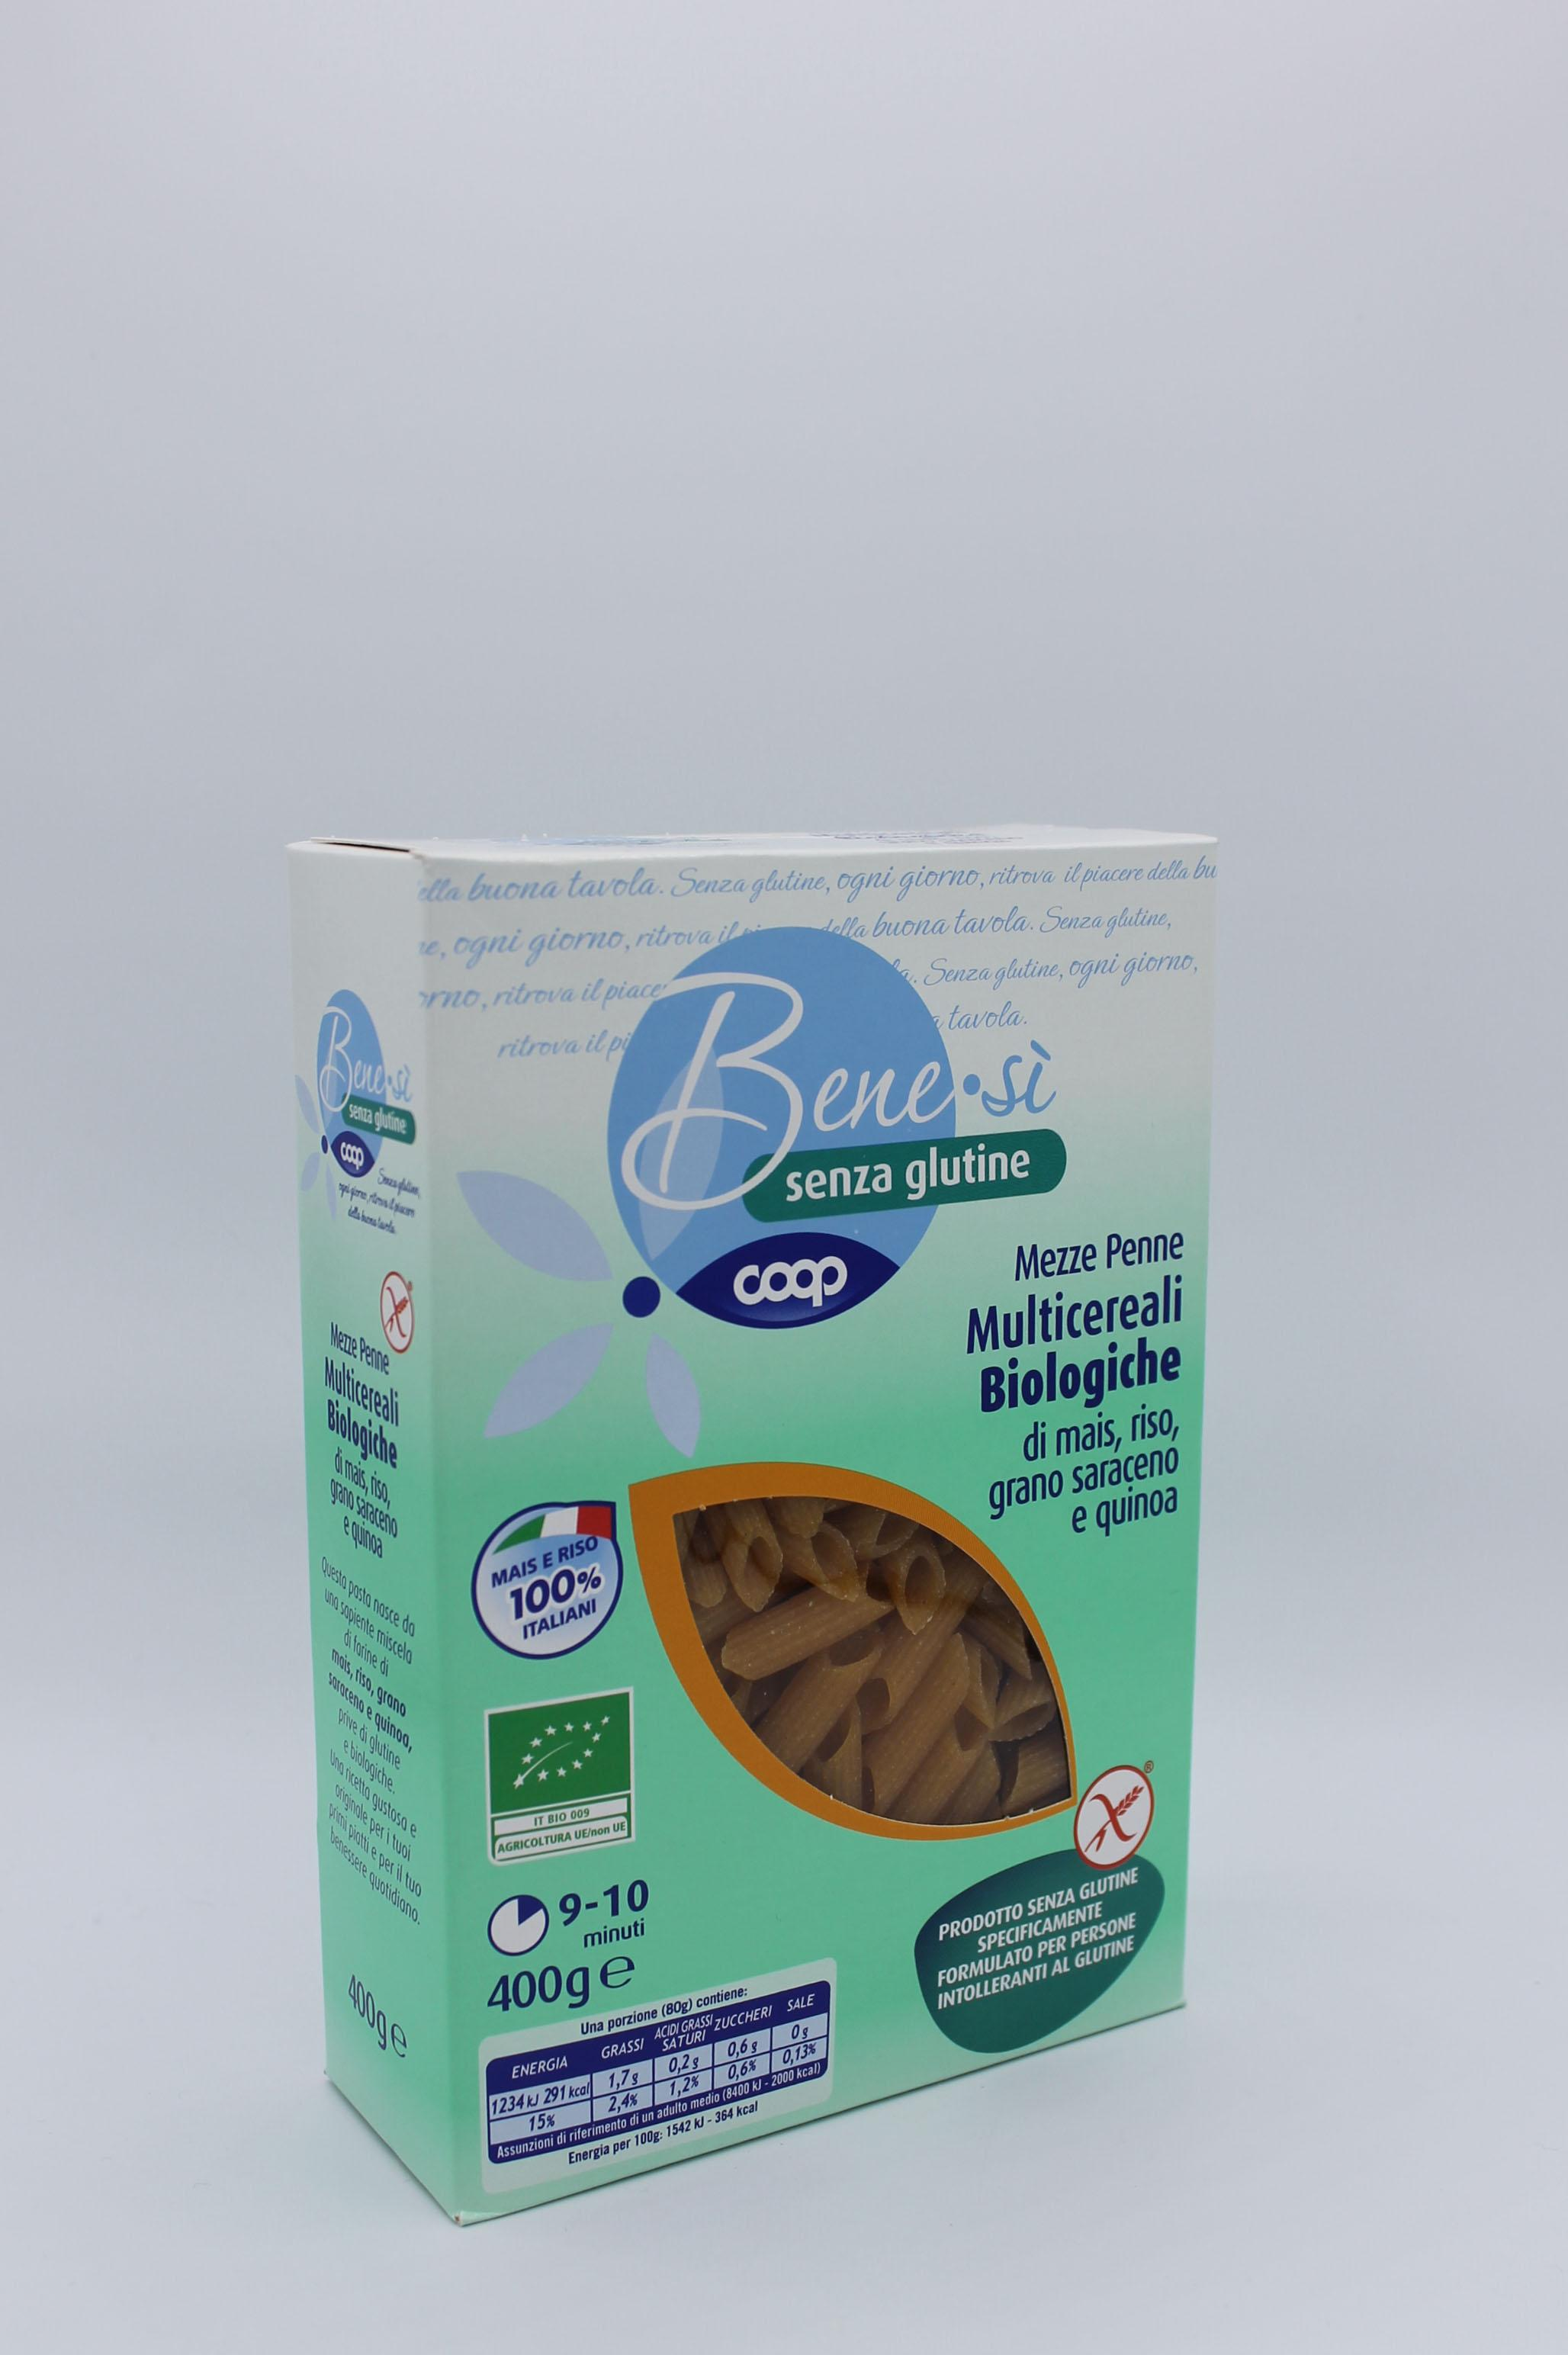 Coop benesì pasta corta senza glutine 400gr vari formati.